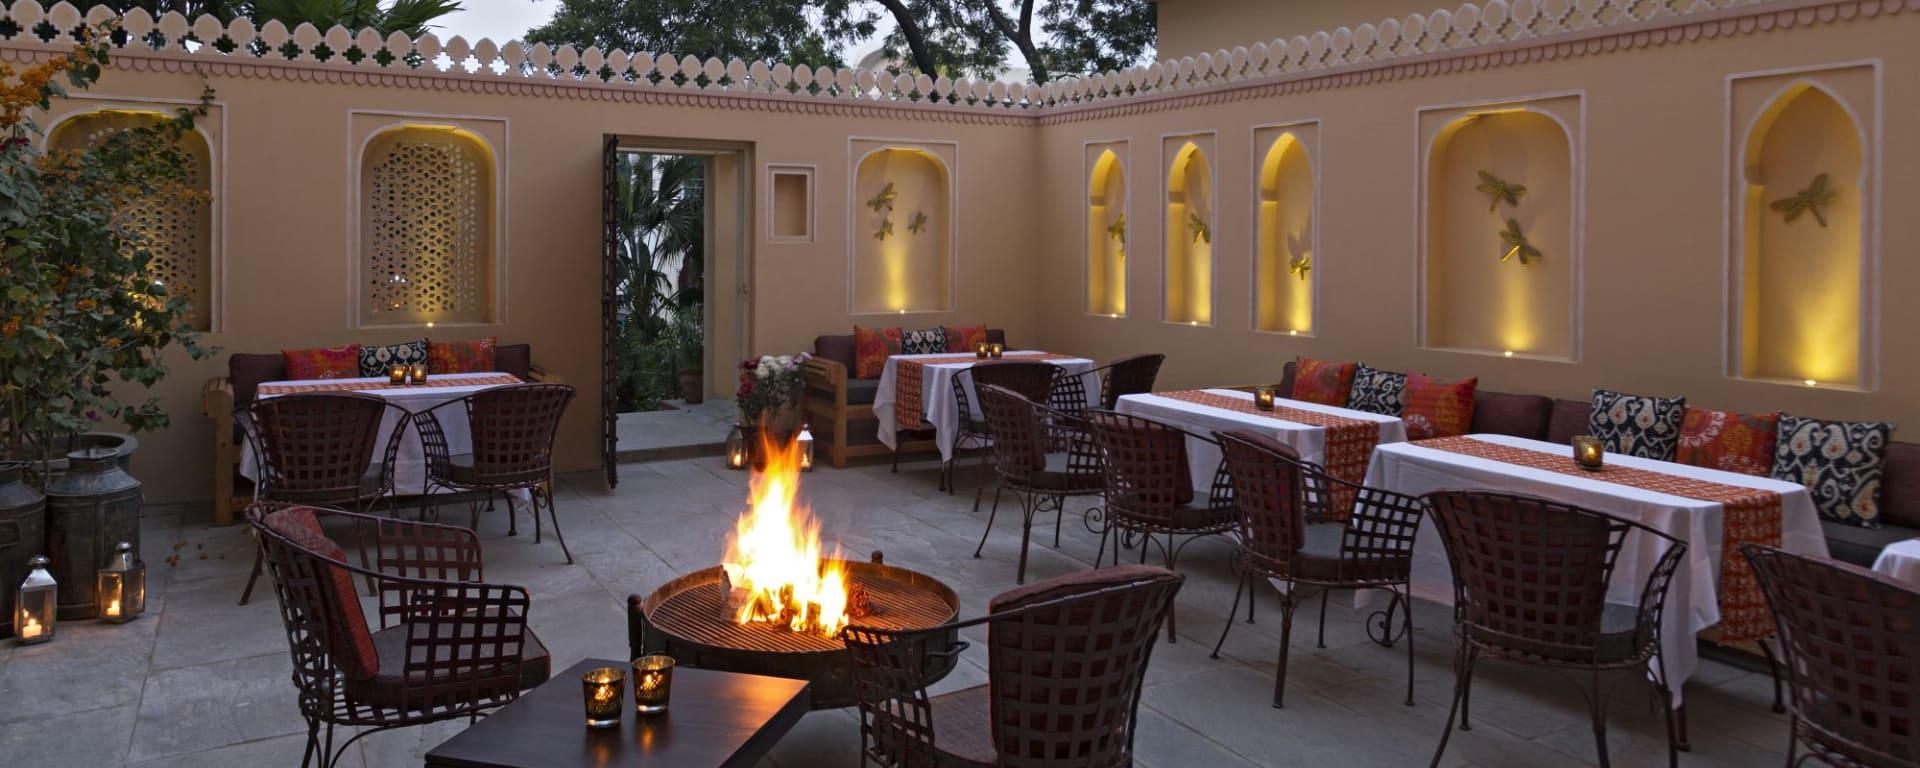 Samode Haveli in Jaipur: Dining & Bar